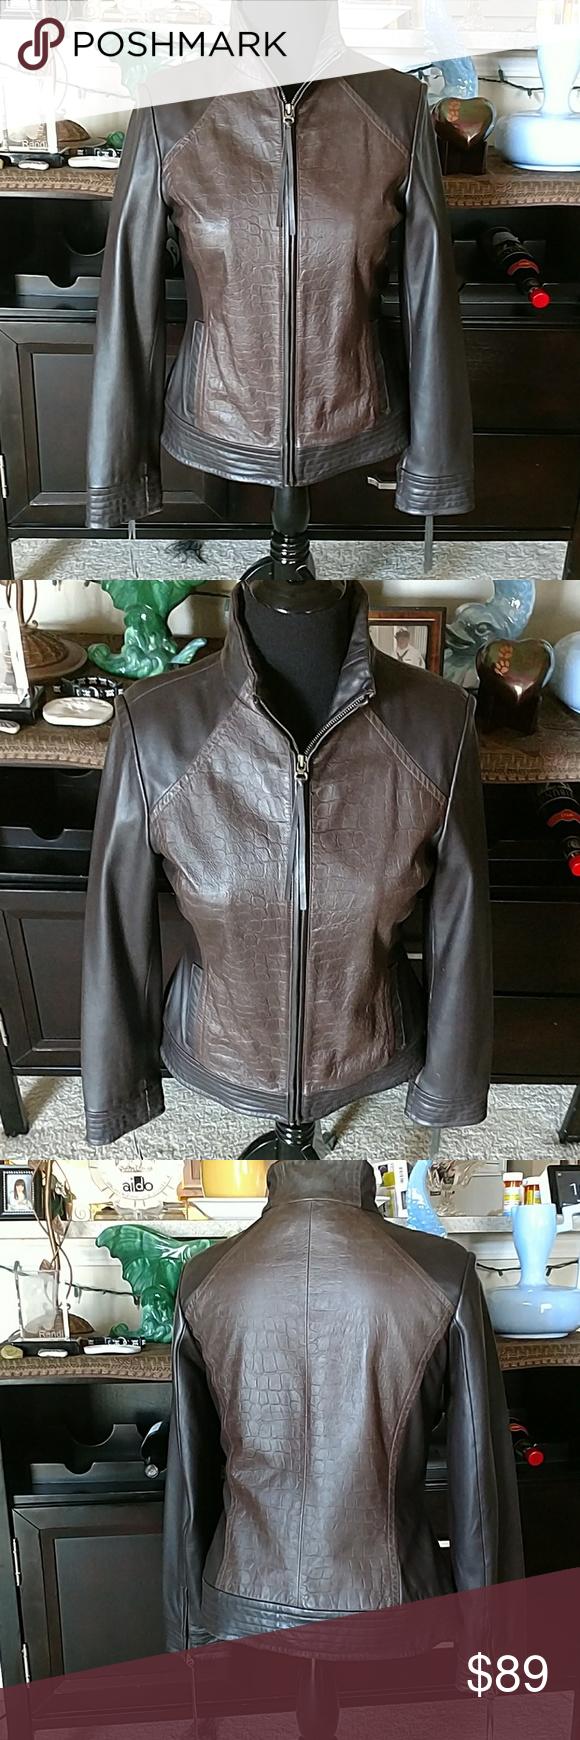 Via Spiga Leather Jacket Leather Jacket Jackets Clothes Design [ 1740 x 580 Pixel ]